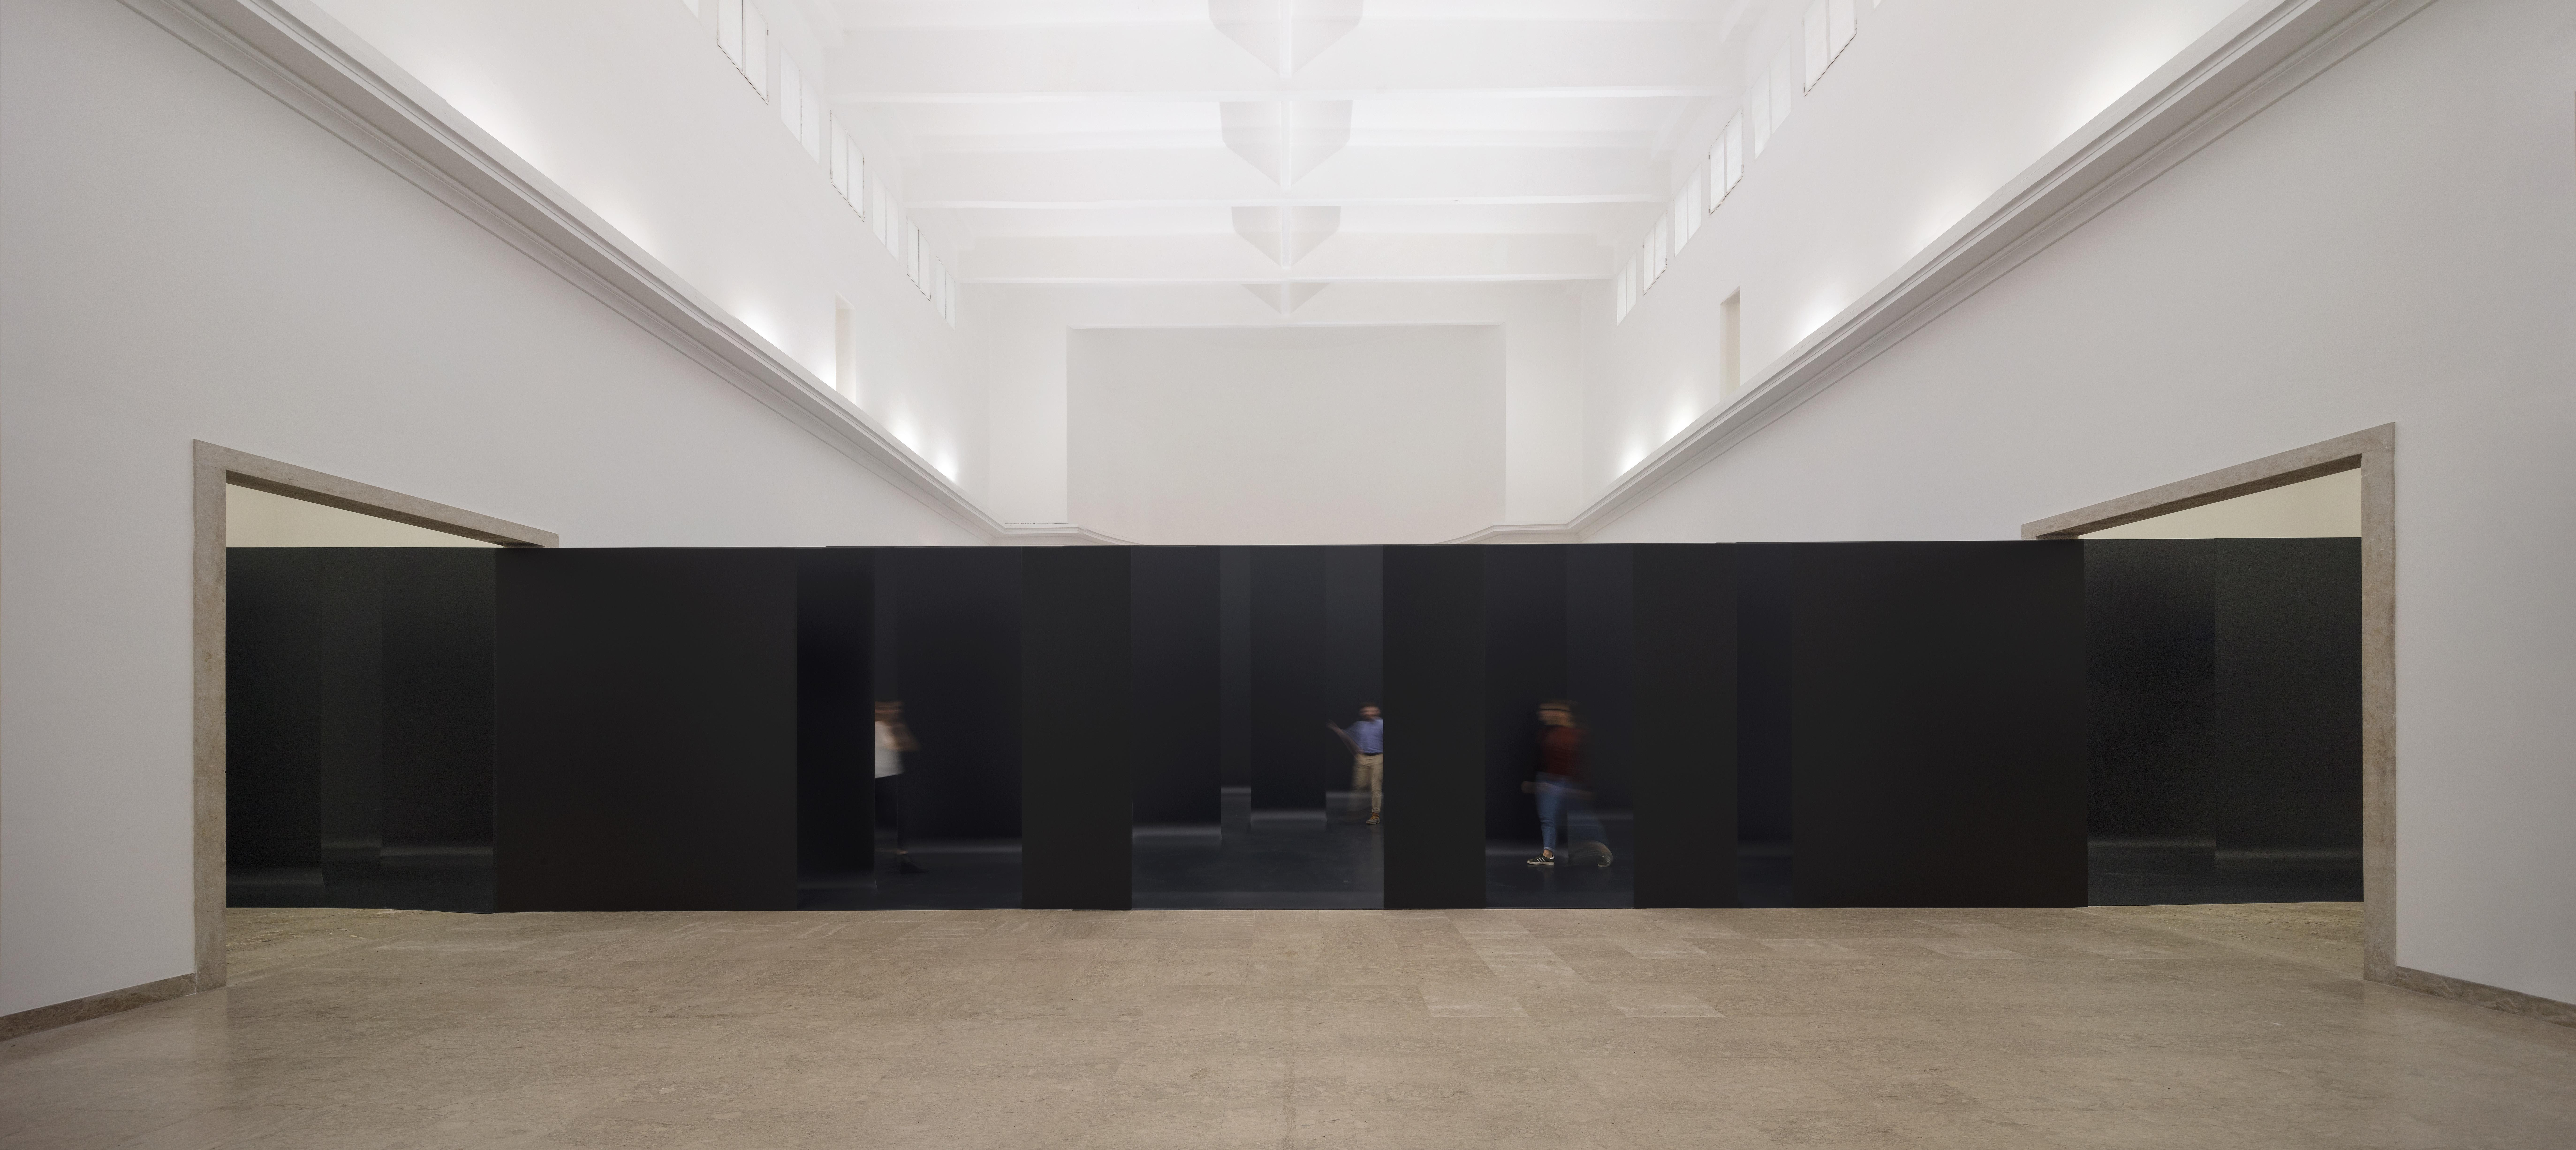 06 German Pavilion Biennale Architettura 2018 C Jan Bitter